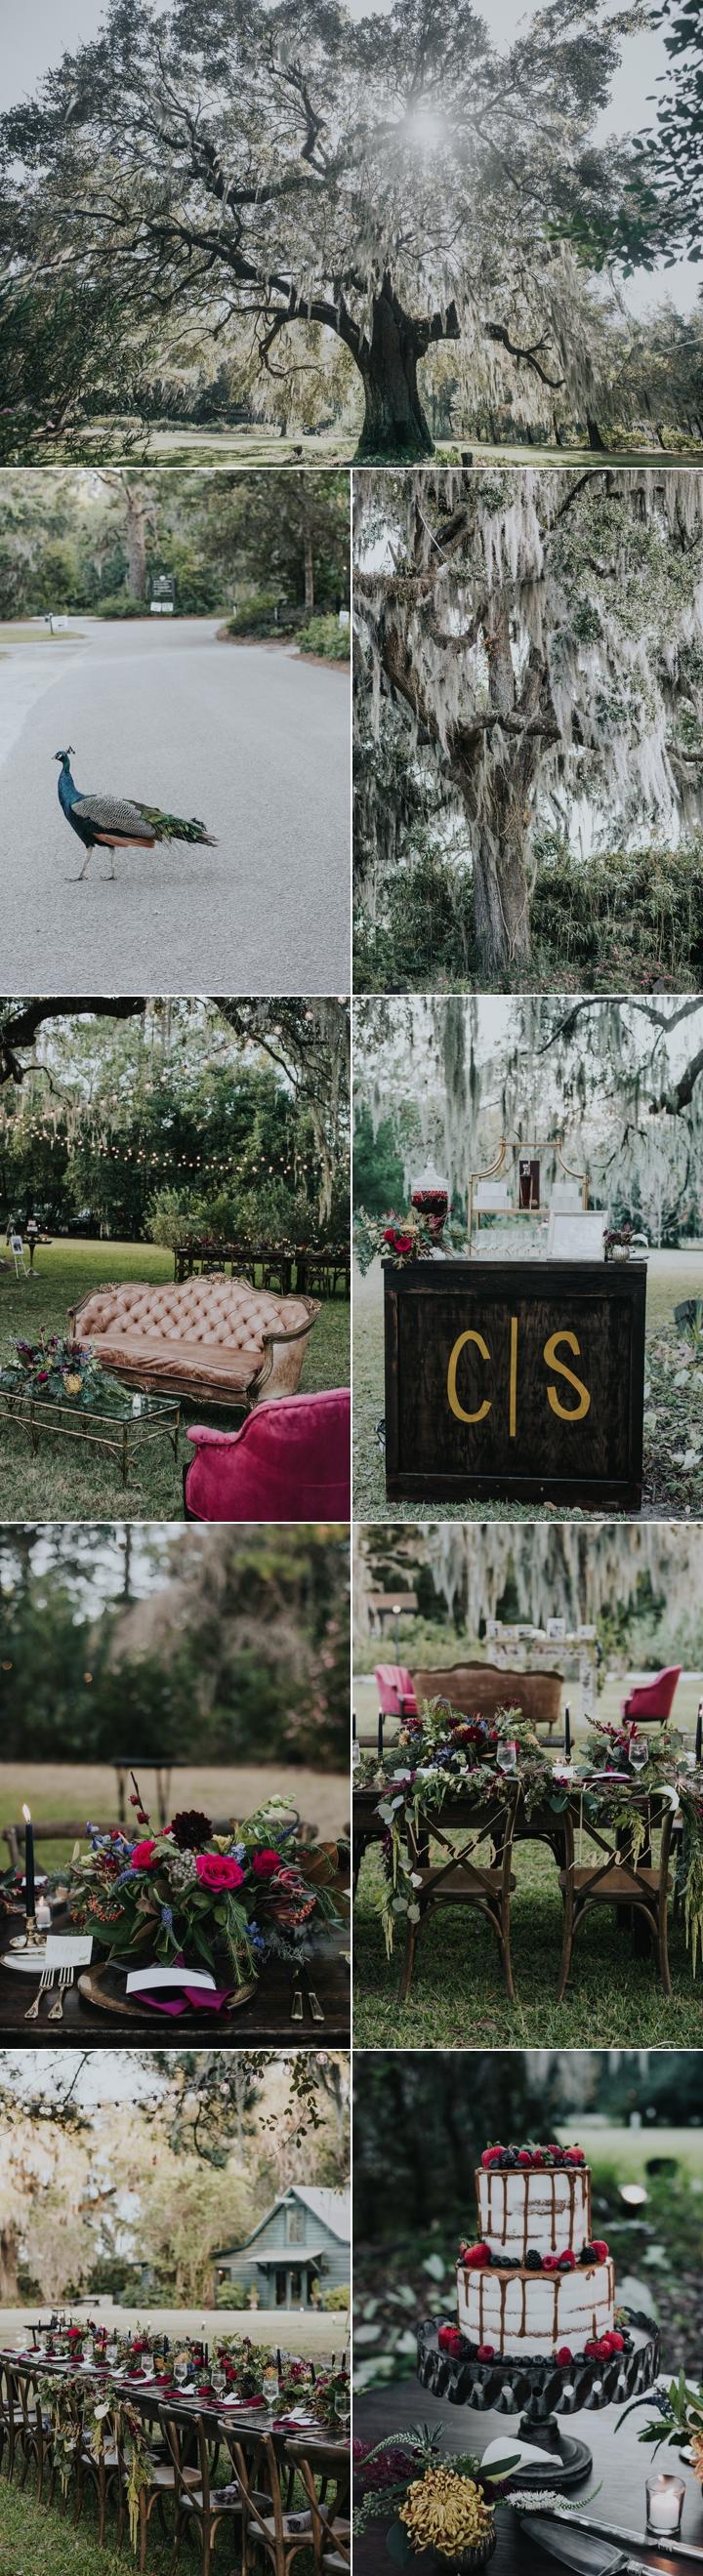 magnolia plantation weddings charleston sc 20.jpg